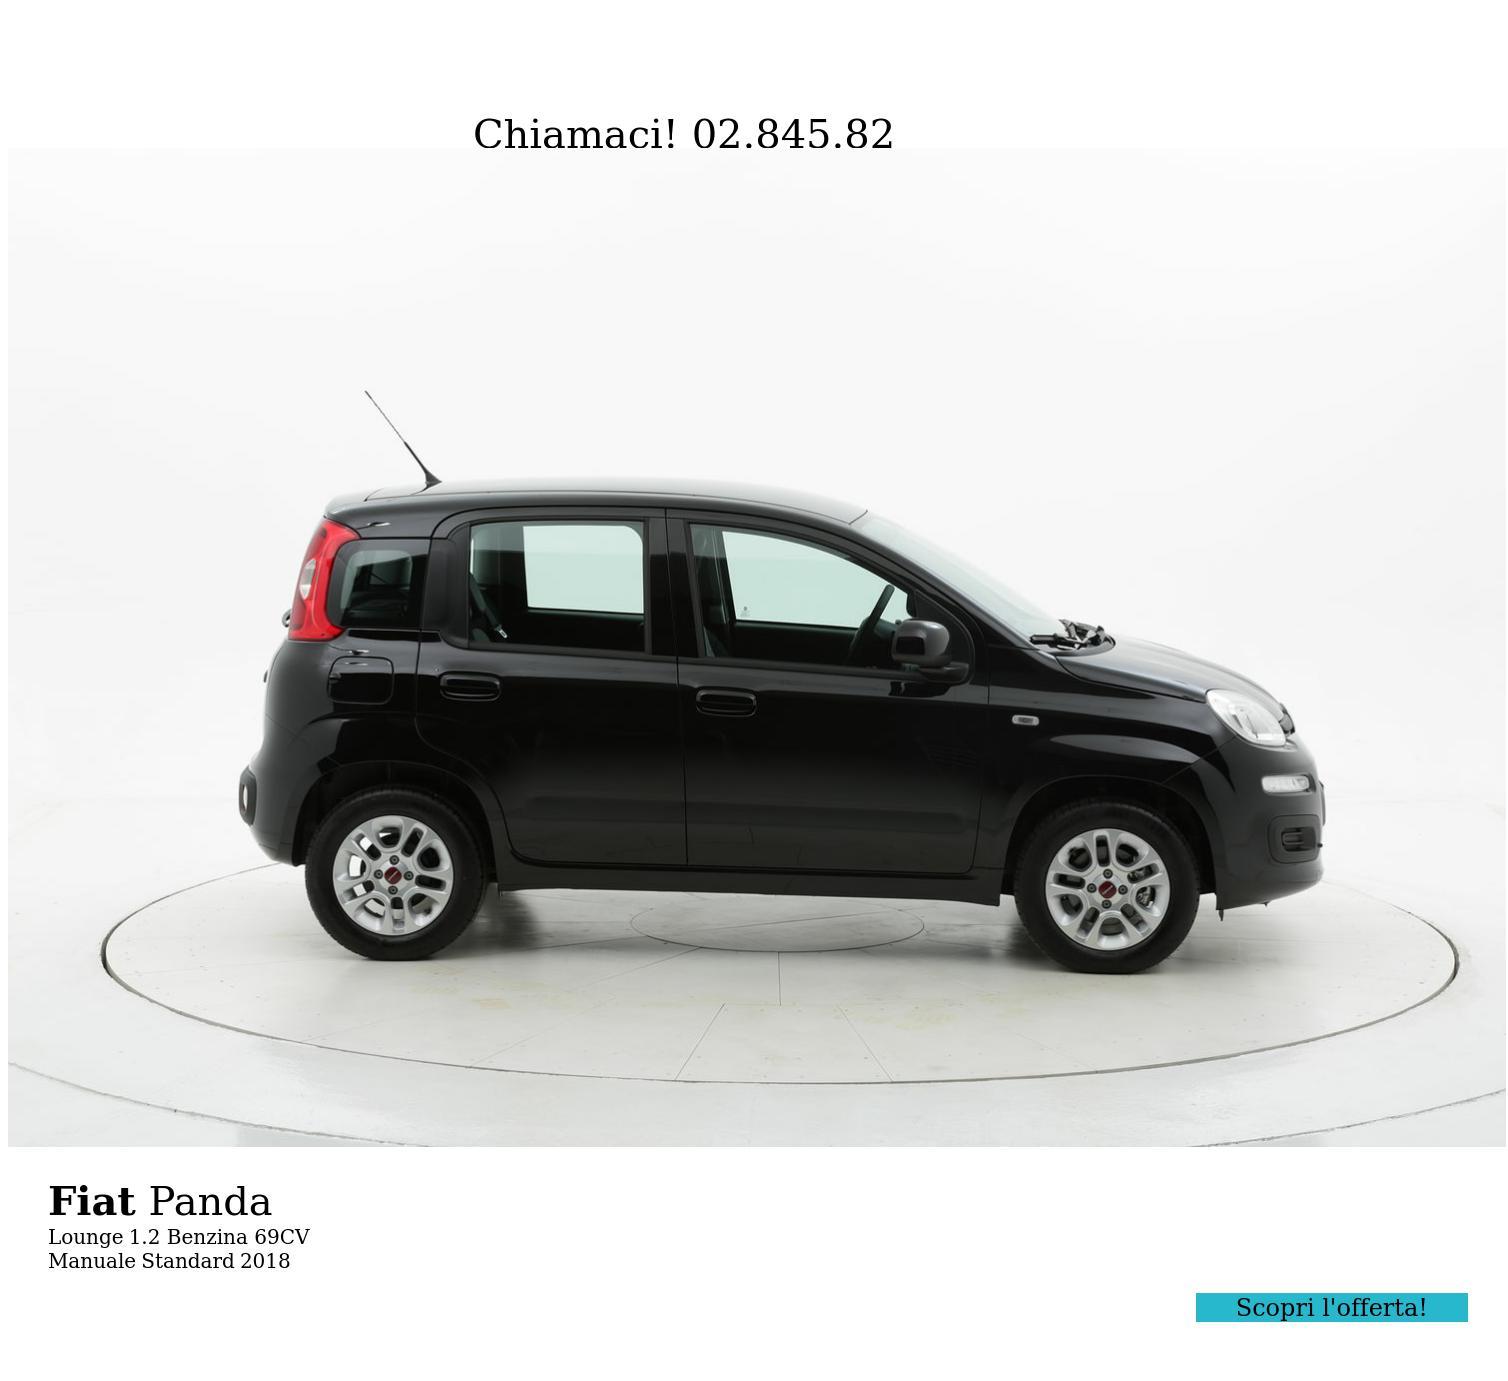 Fiat Panda Lounge km 0 benzina nera | brumbrum